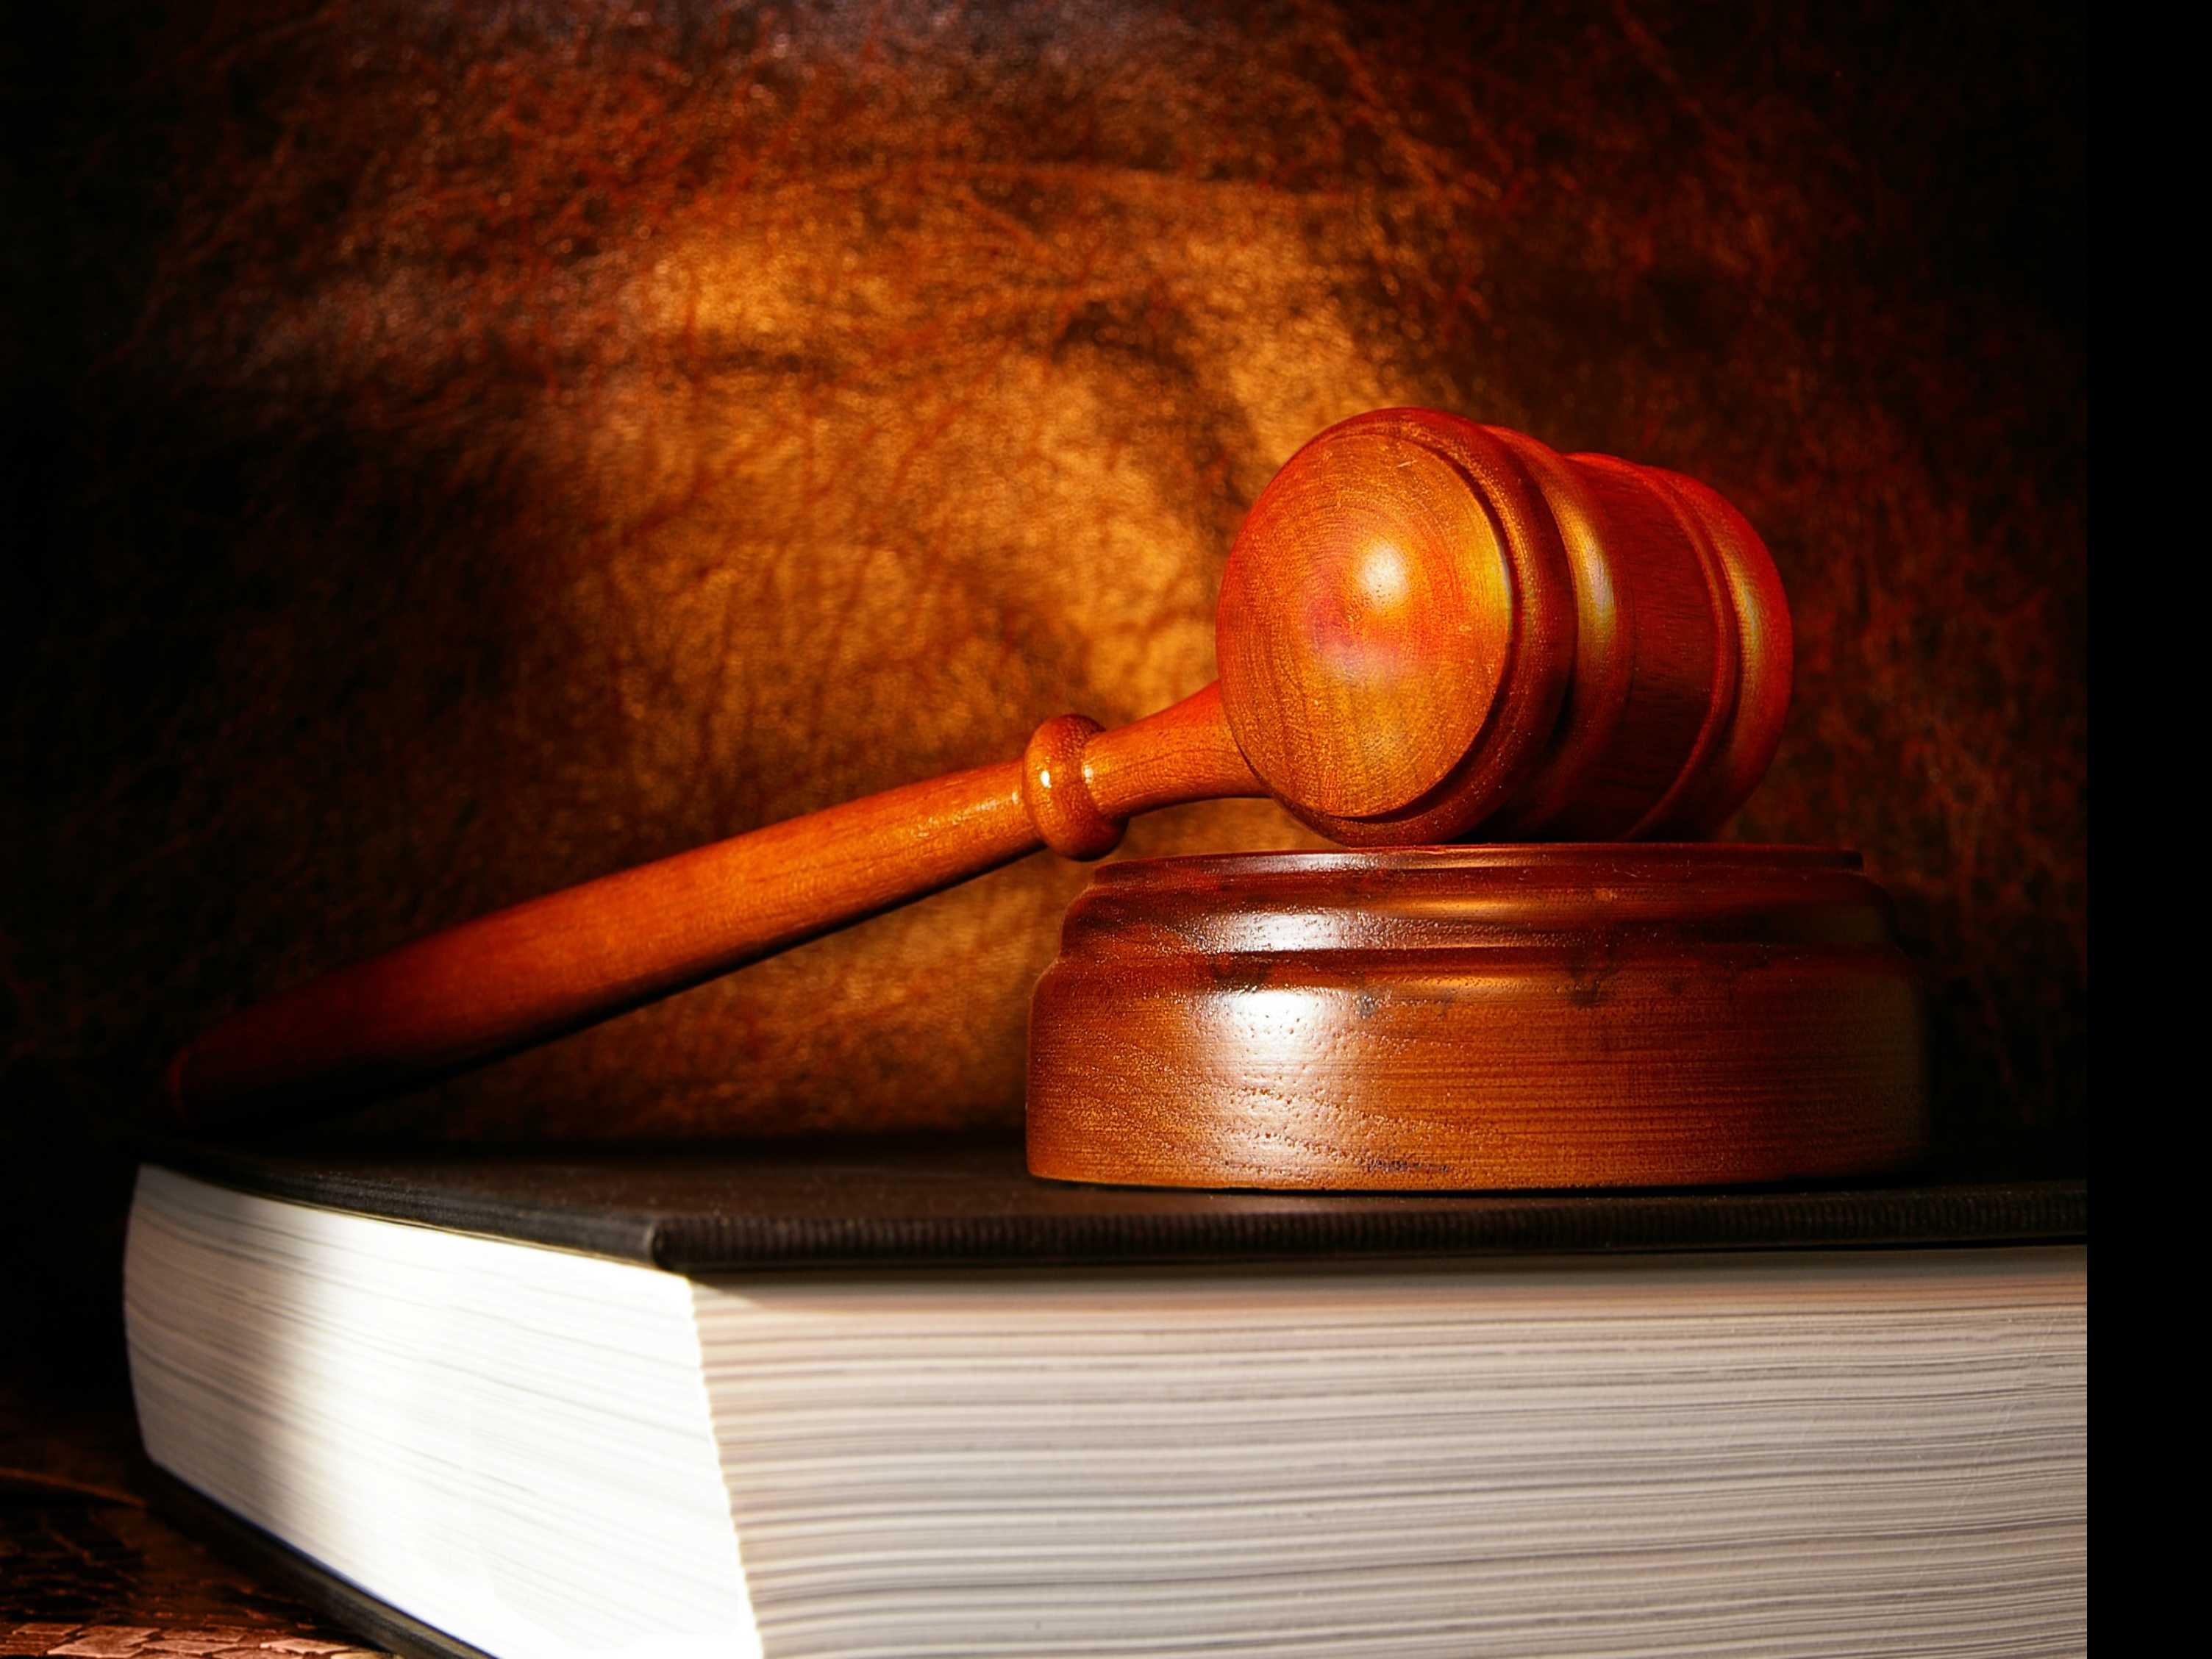 Court Overturns Missouri Football Player's Sodomy Conviction